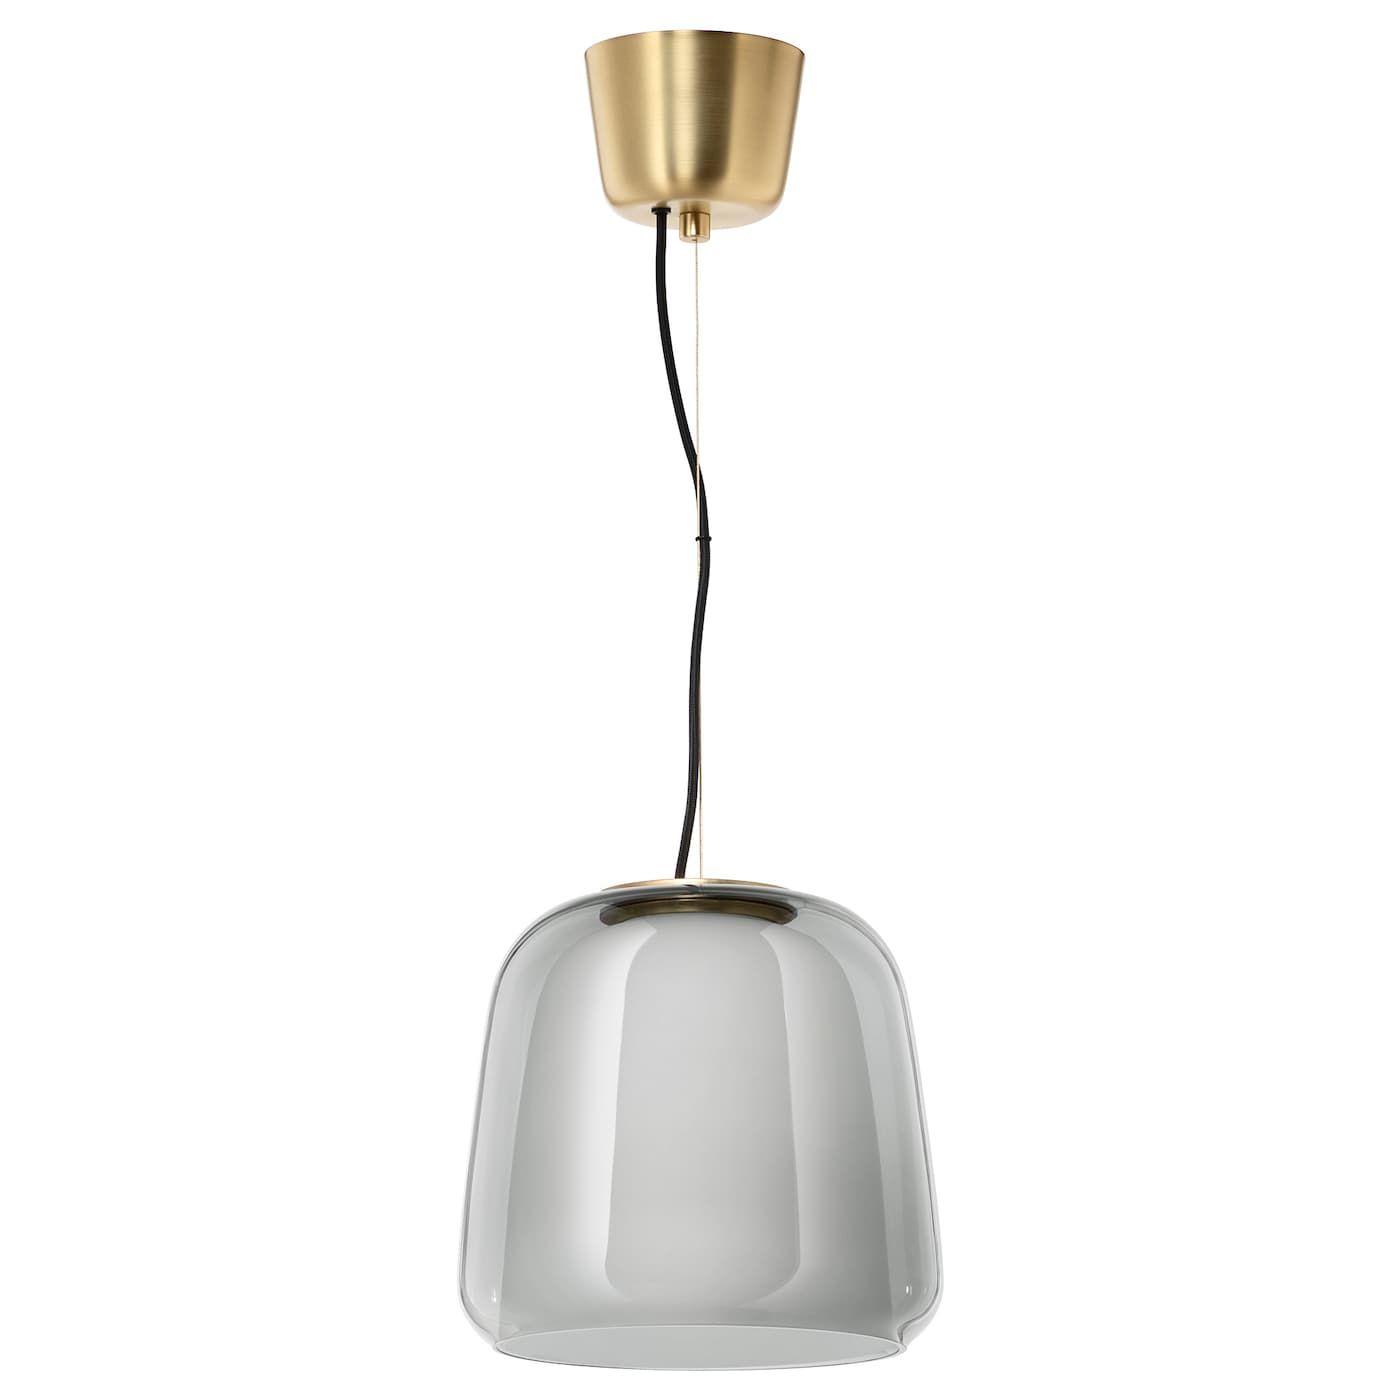 Evedal Pendant Lamp Grey With Images Pendant Lamp Lamp Ceiling Lamp